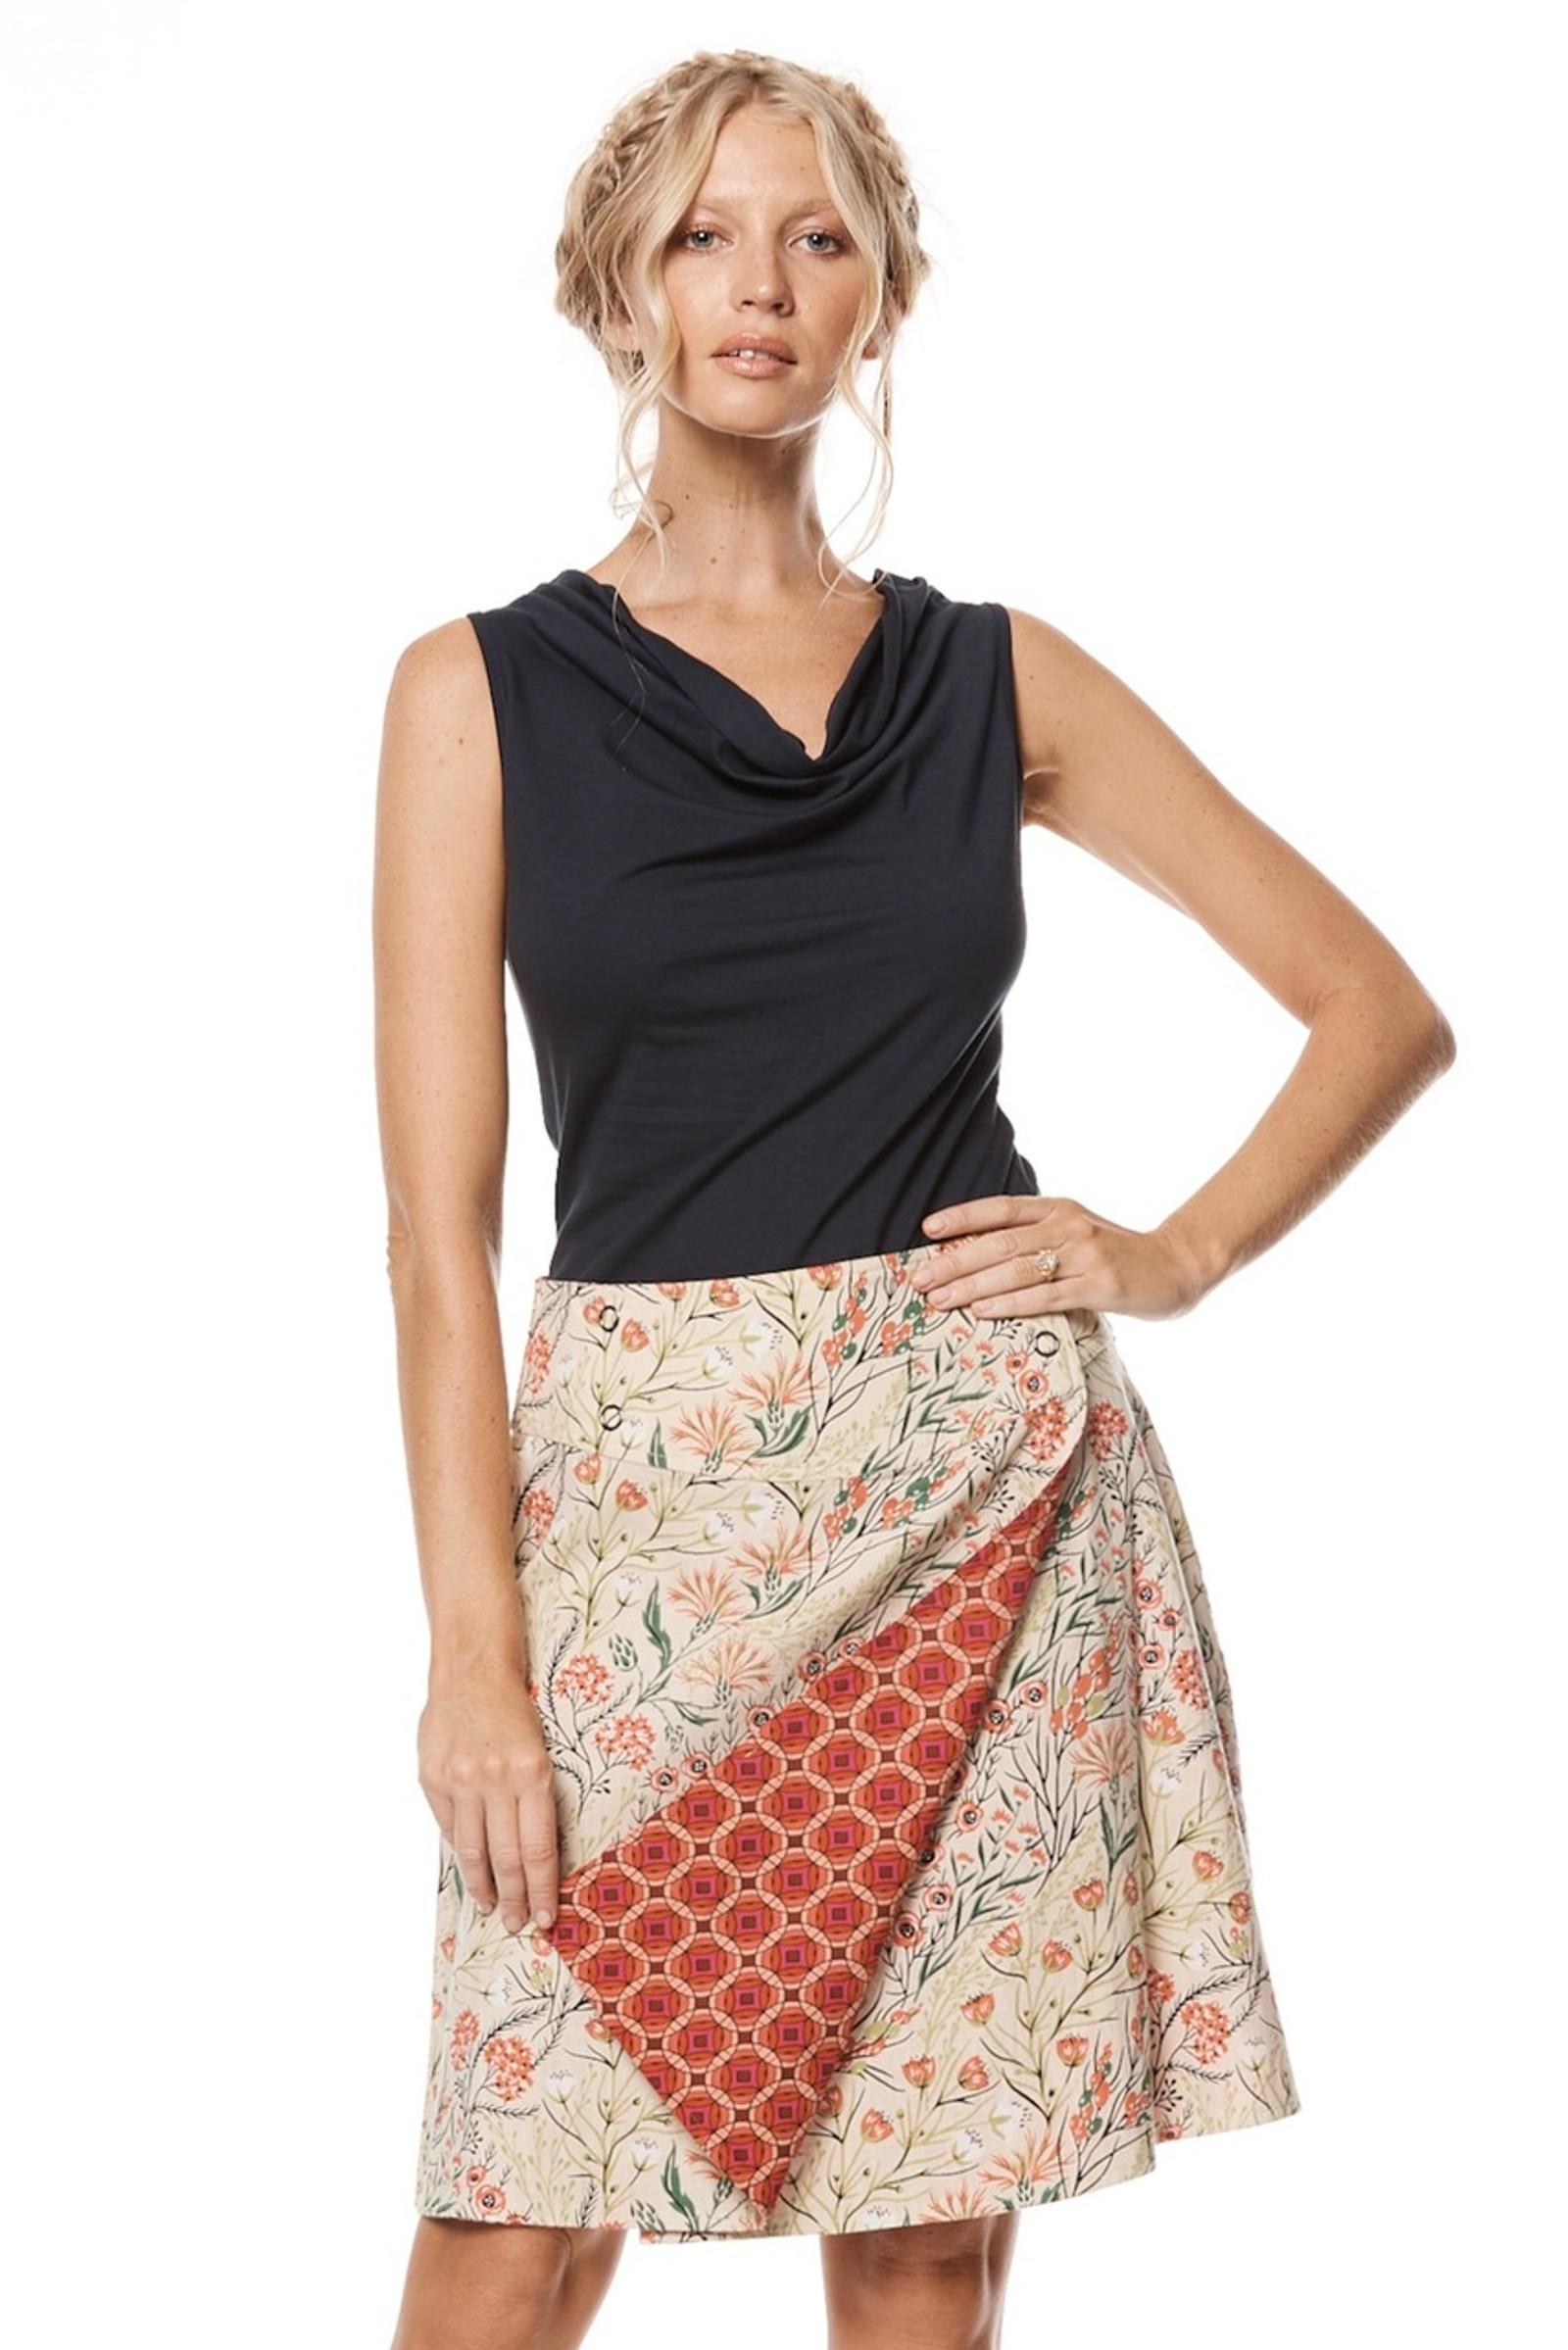 Reversible Skirt - Coral & Kaleido Peach